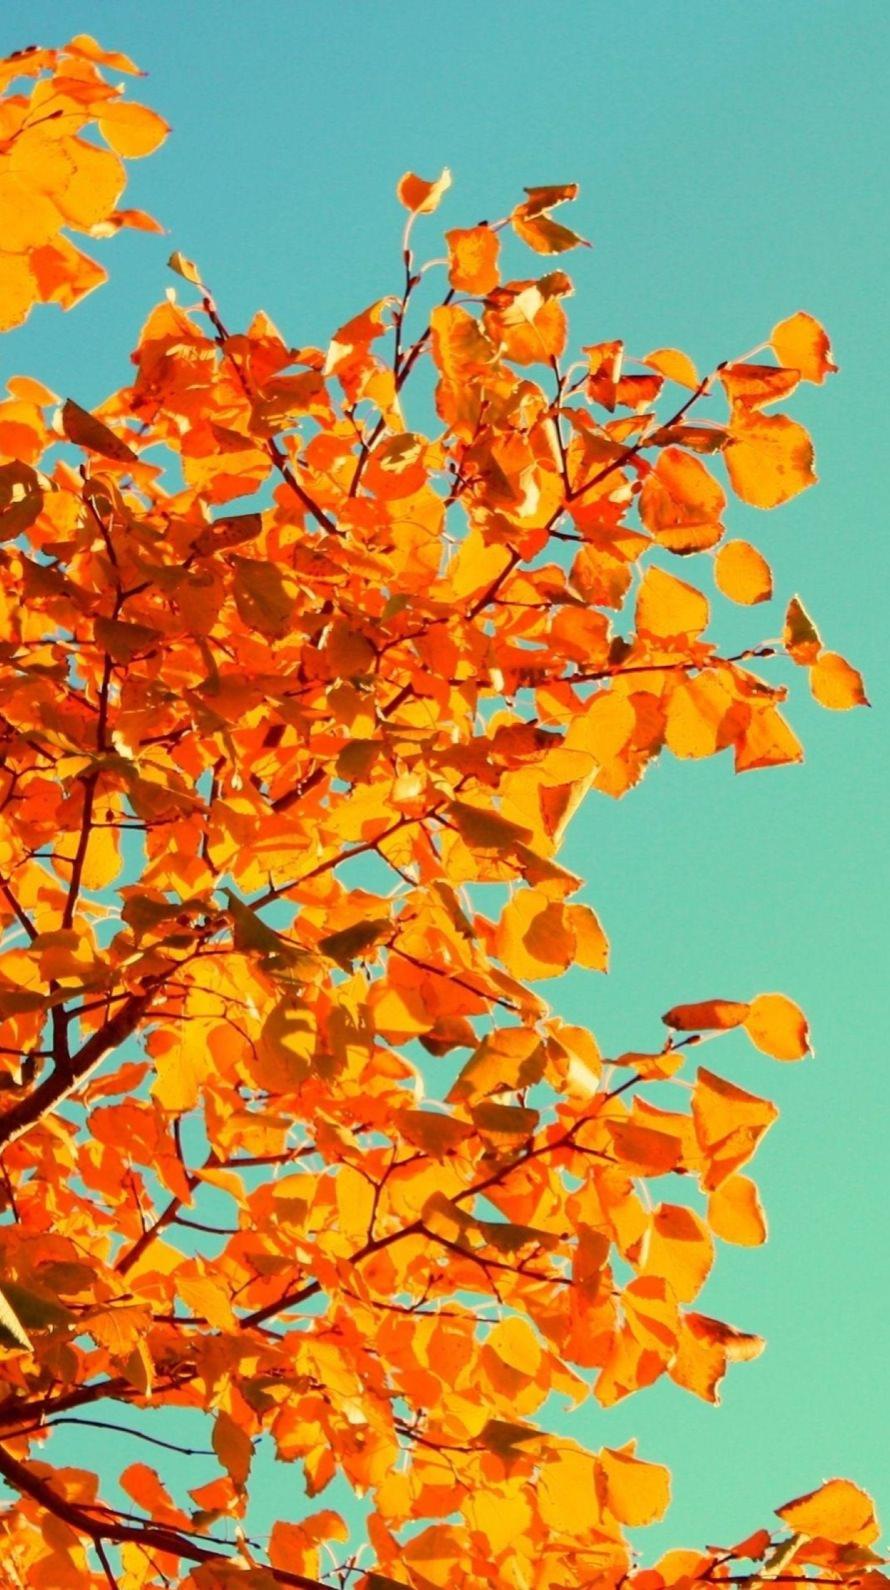 Aesthetic Tumblr Autumn Desktop Wallpaper Cuteanimals